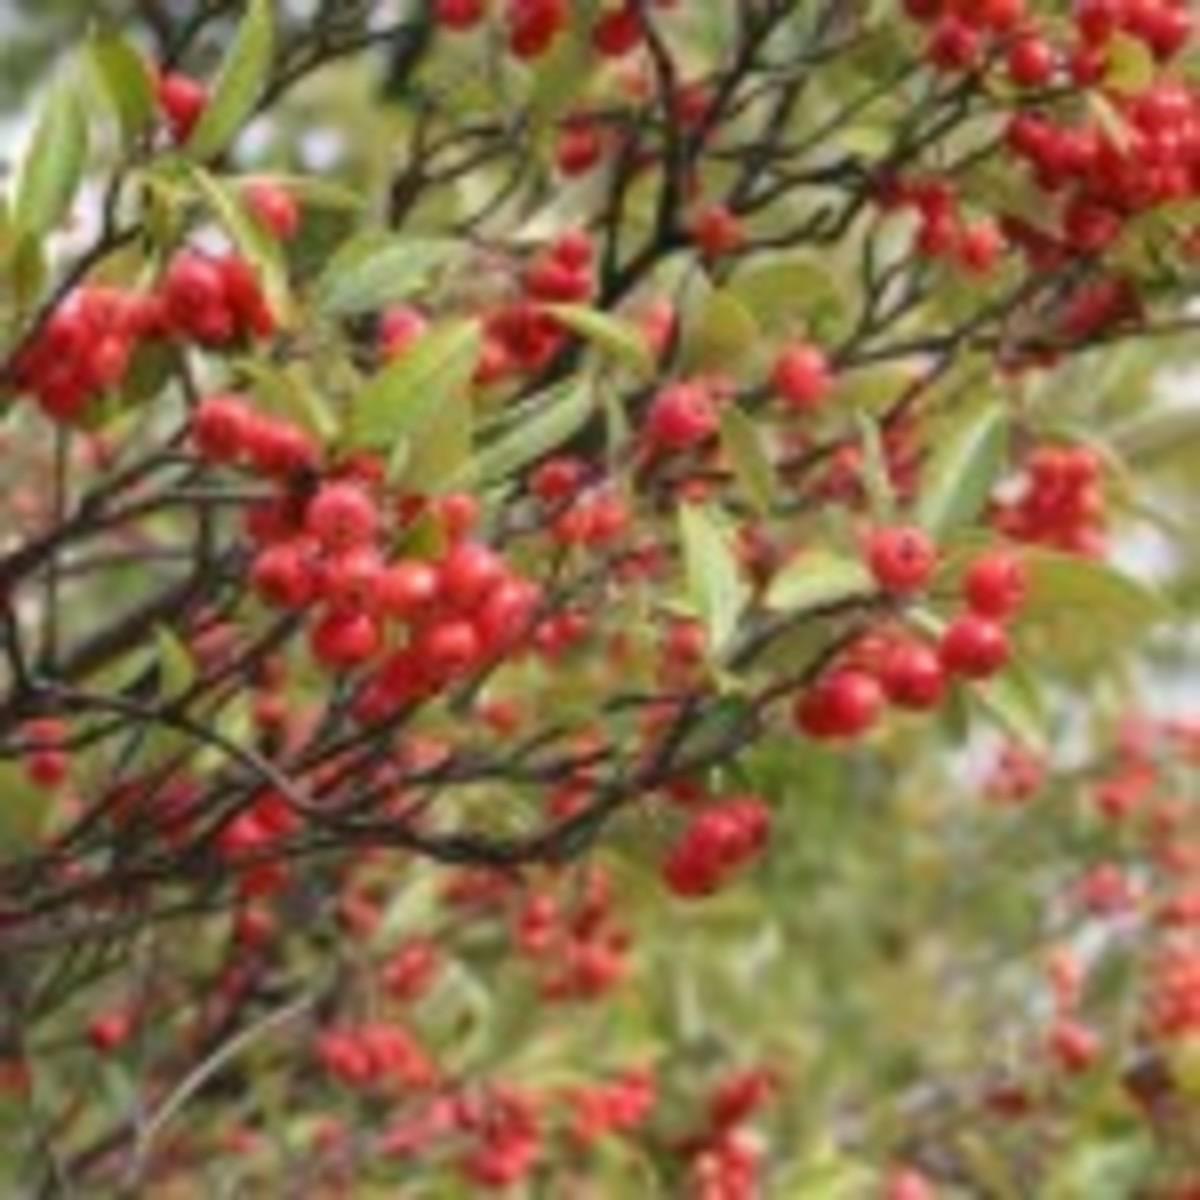 chokeberry aronia arbutifolia